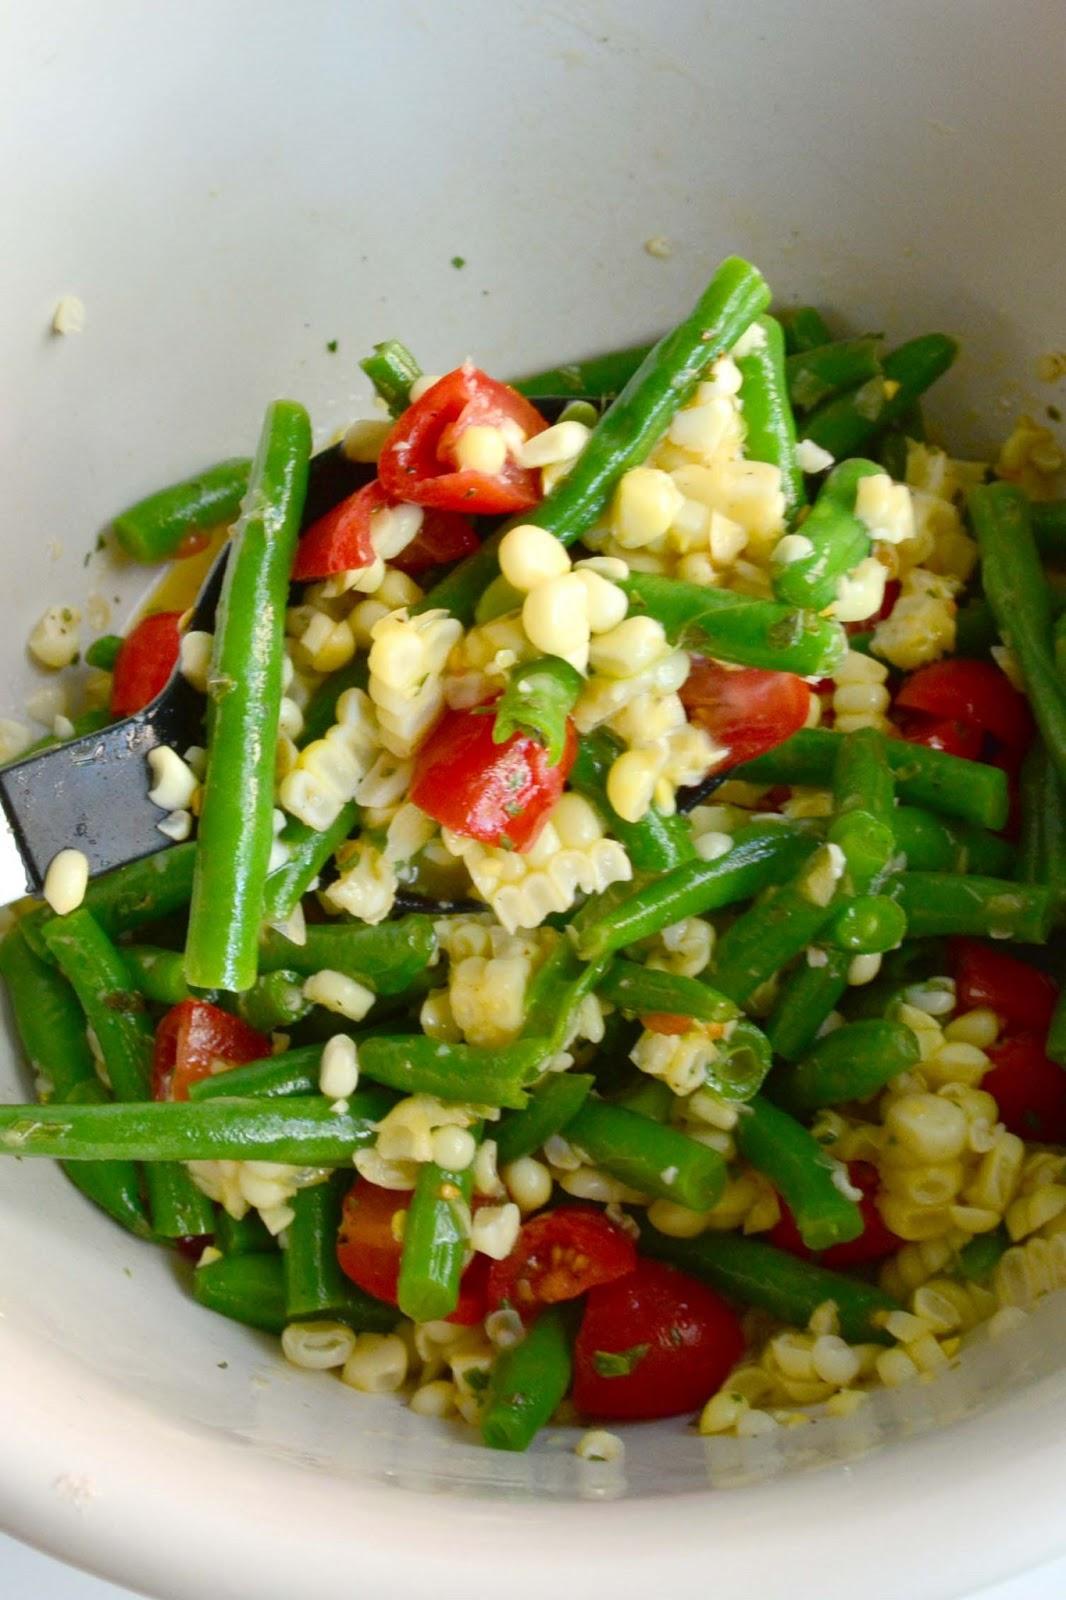 ... Nest: Recipe: Garlicky Green Bean, Sweet Corn and Tomato Salad